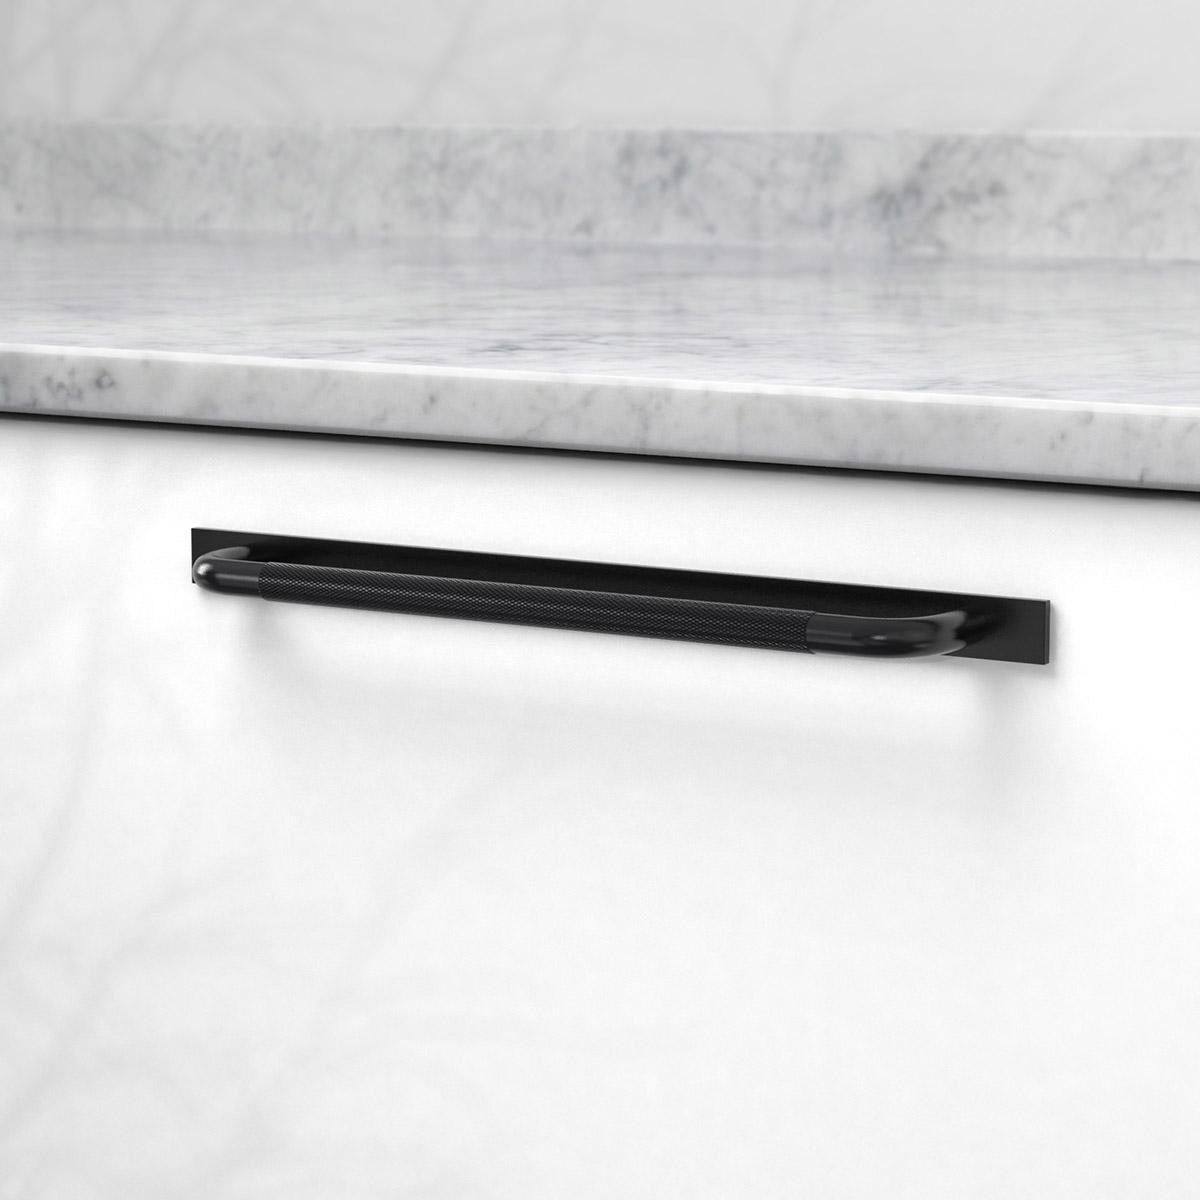 Handtag helix med bricka matt svart 309085 11 cc 224 mm ncs s 3000 n granit svart